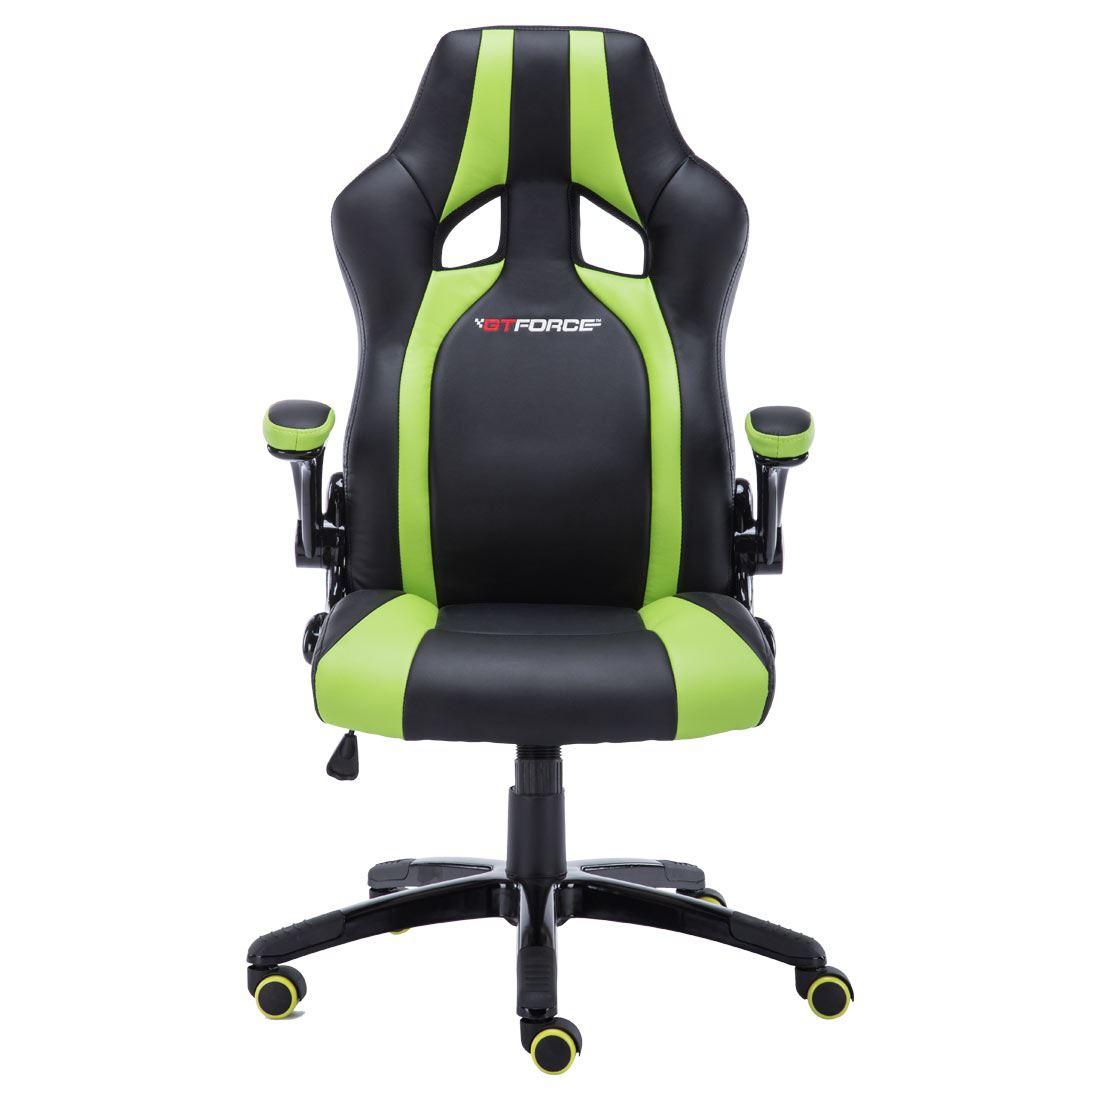 race car desk chair double x back dining gtforce roadster 2 green black sport racing office